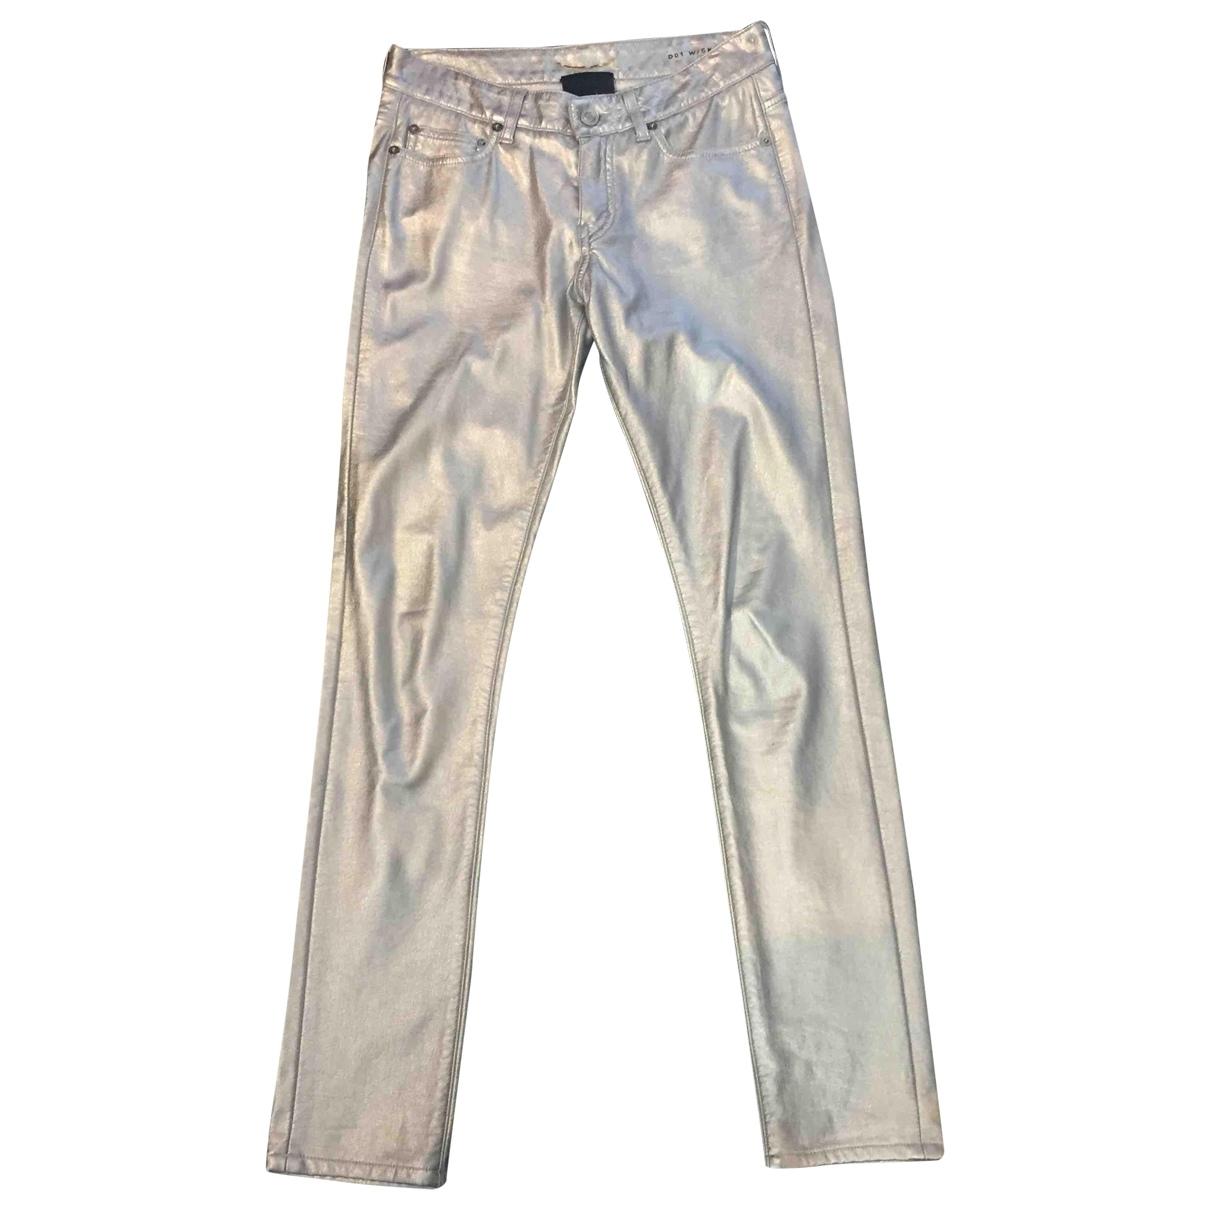 Saint Laurent \N Metallic Cotton Trousers for Women XS International